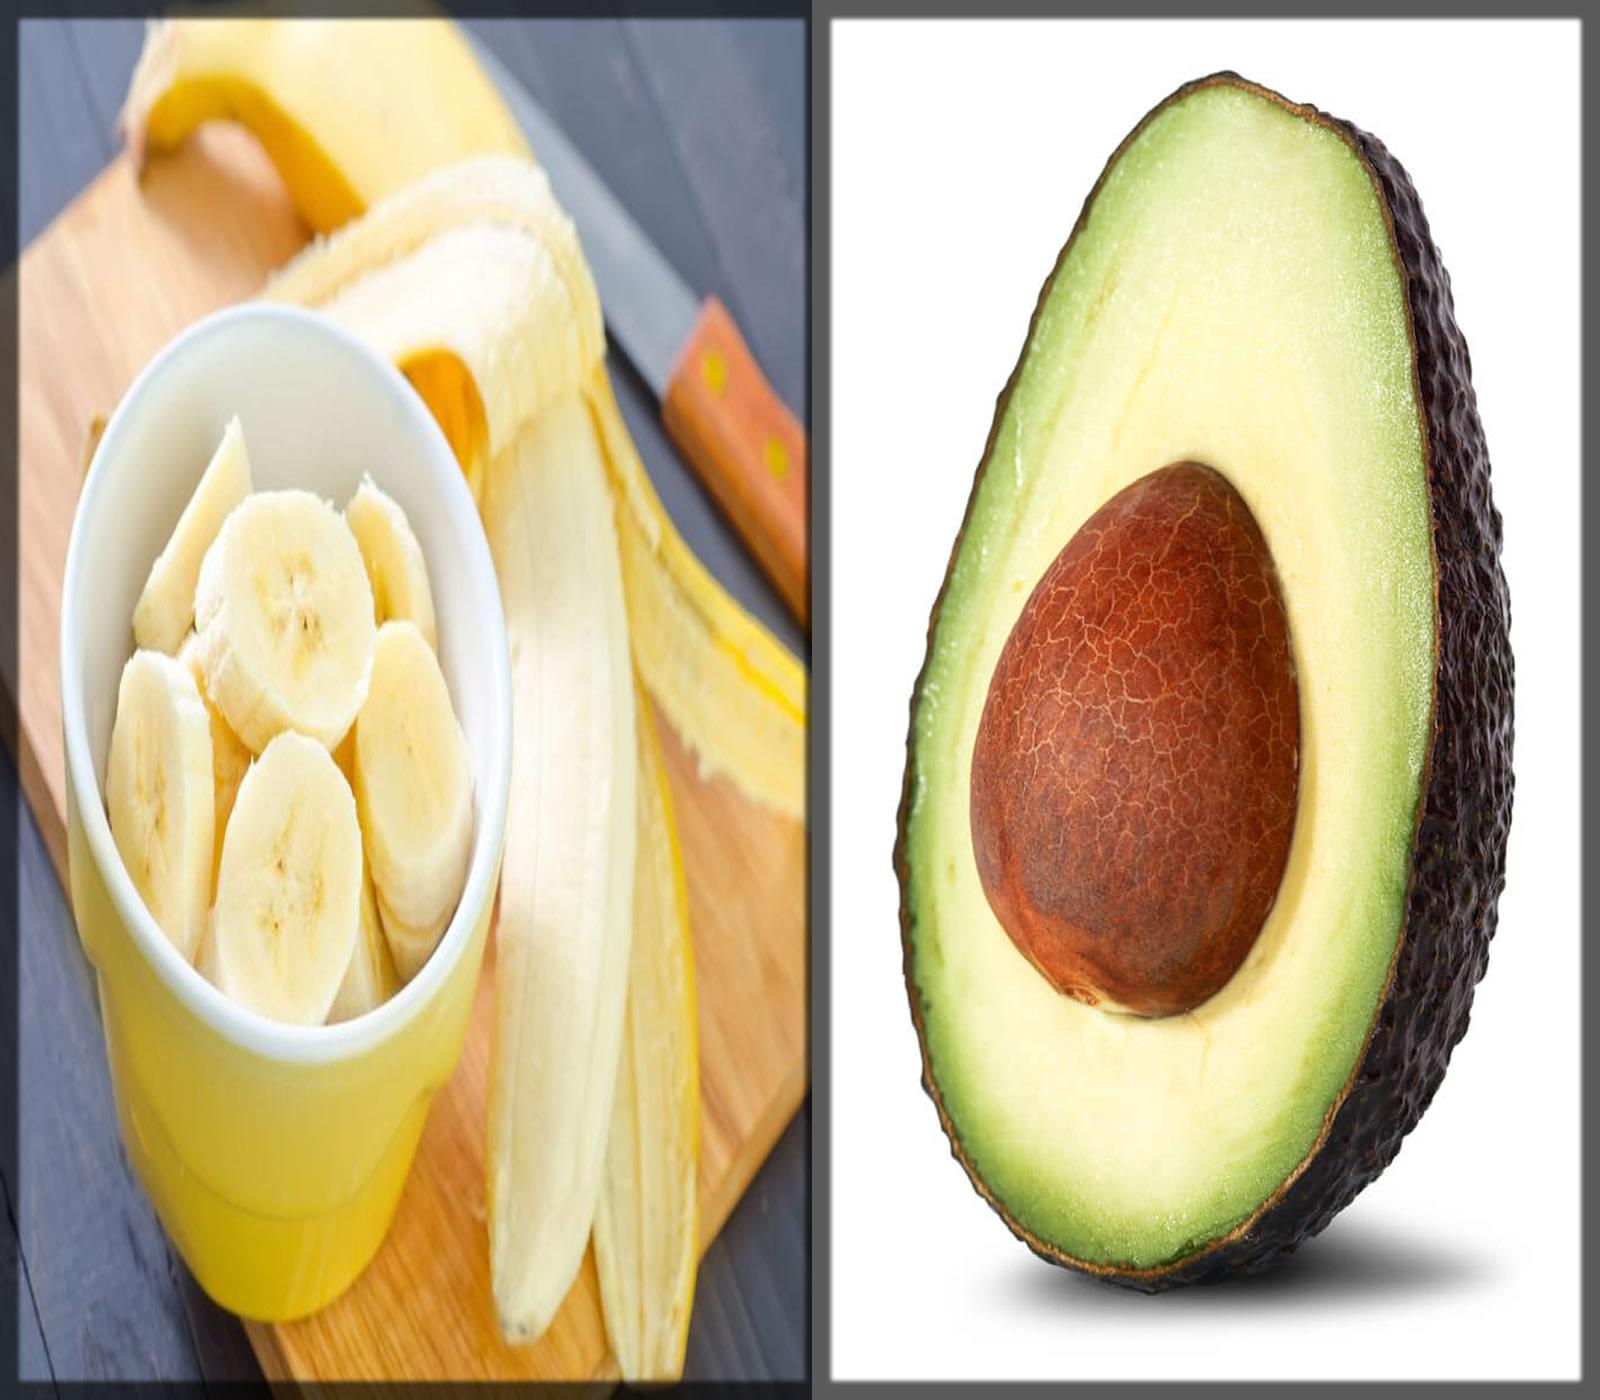 Banana And Avocado Mask